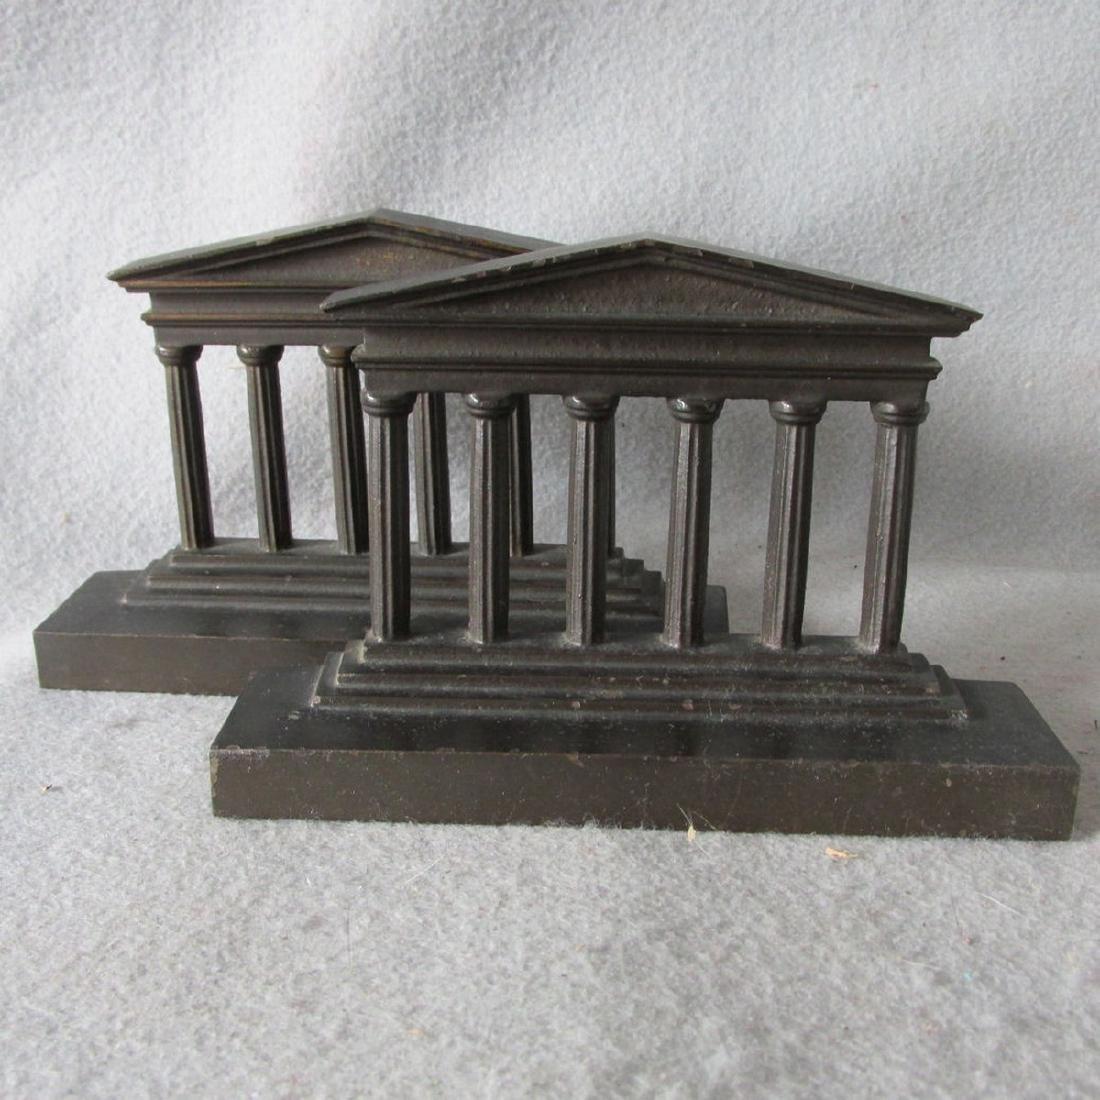 Antique Architectural Column Cast Iron Bookends - 2